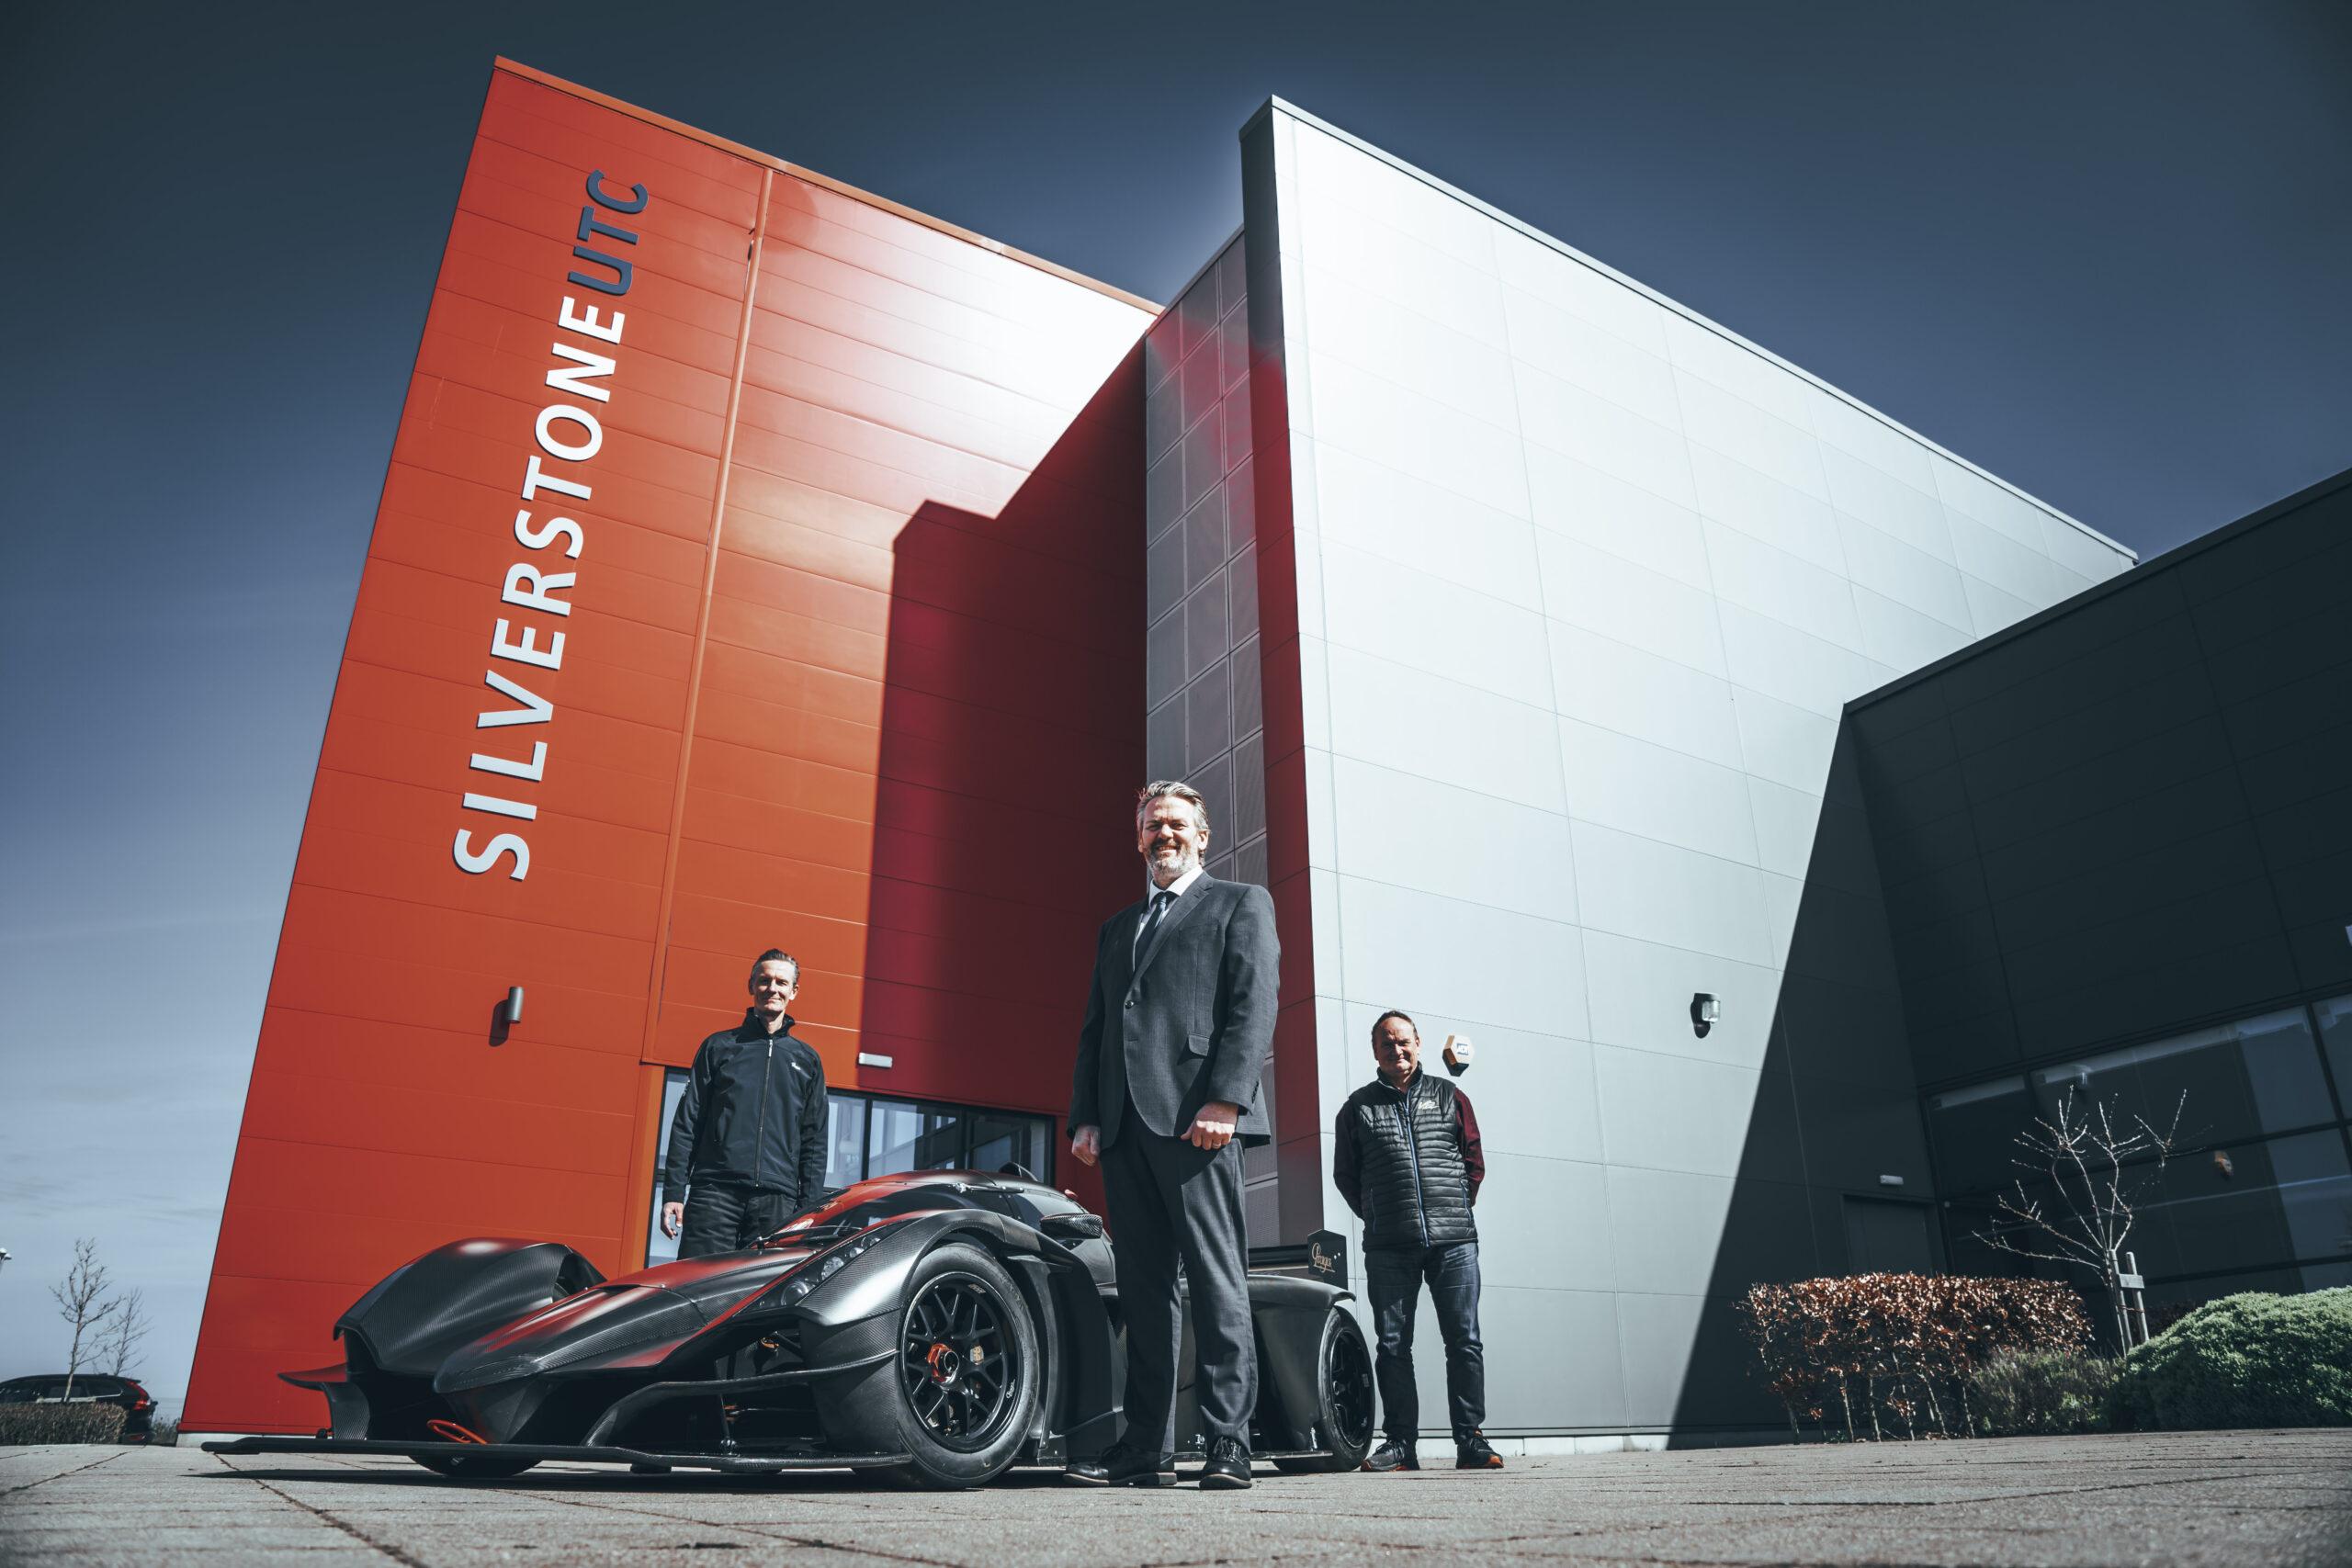 Podium Partnership for Praga Cars, Silverstone  University Technical College and VR  Motorsport